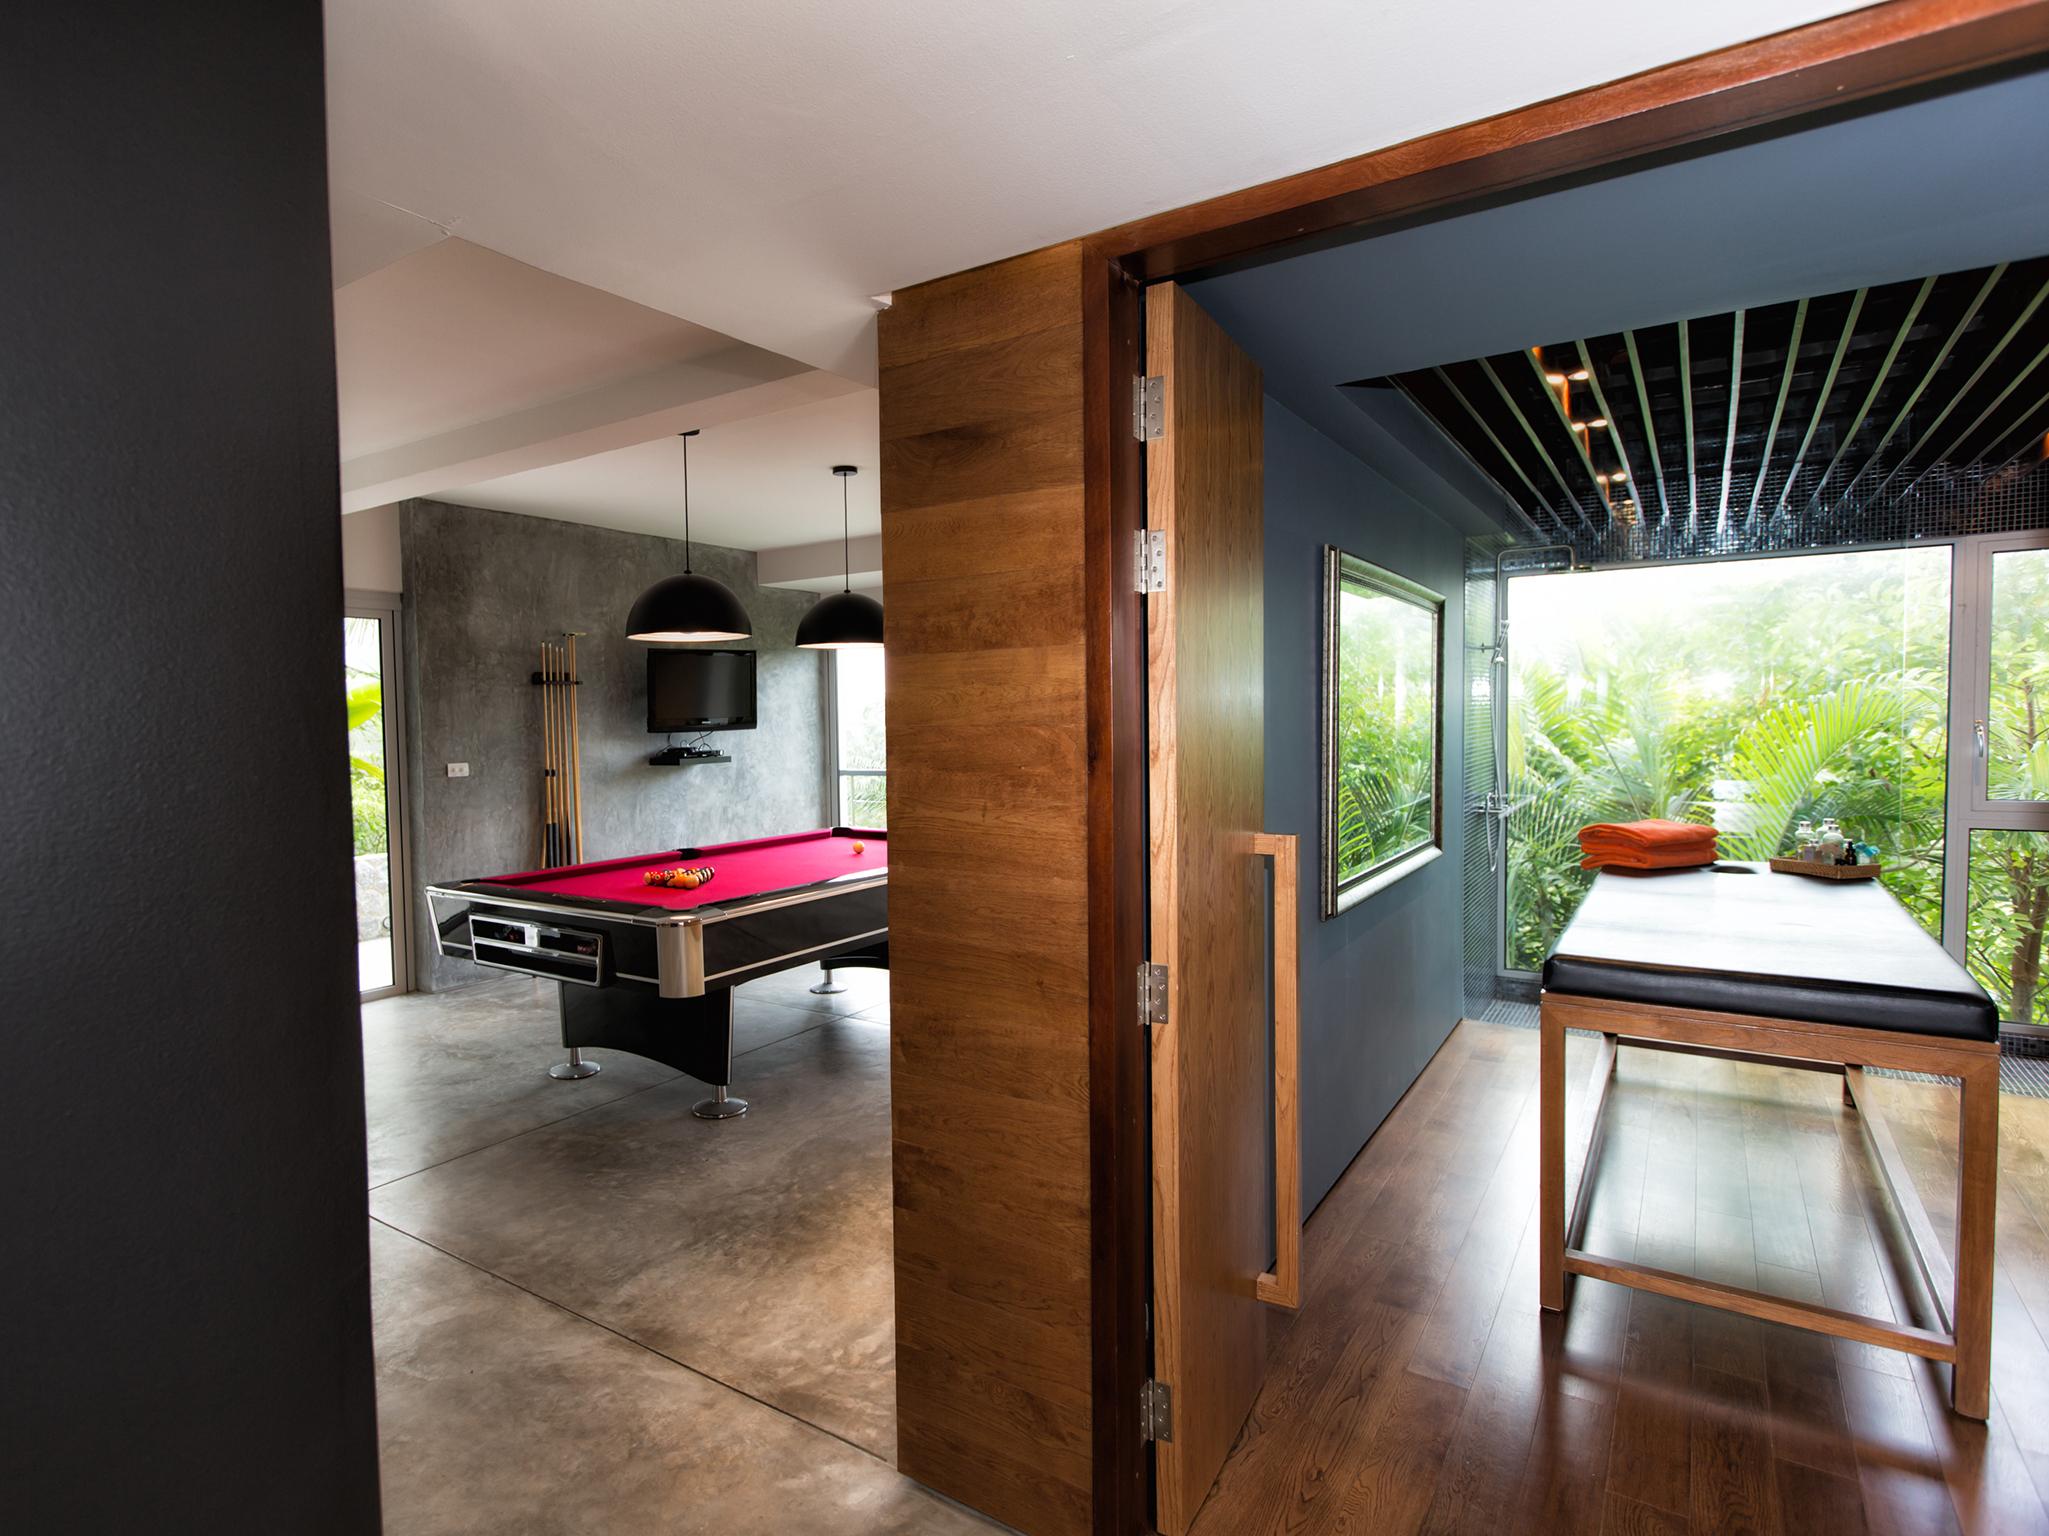 08-Villa Napalai Surin - Pool room and massage room.jpg